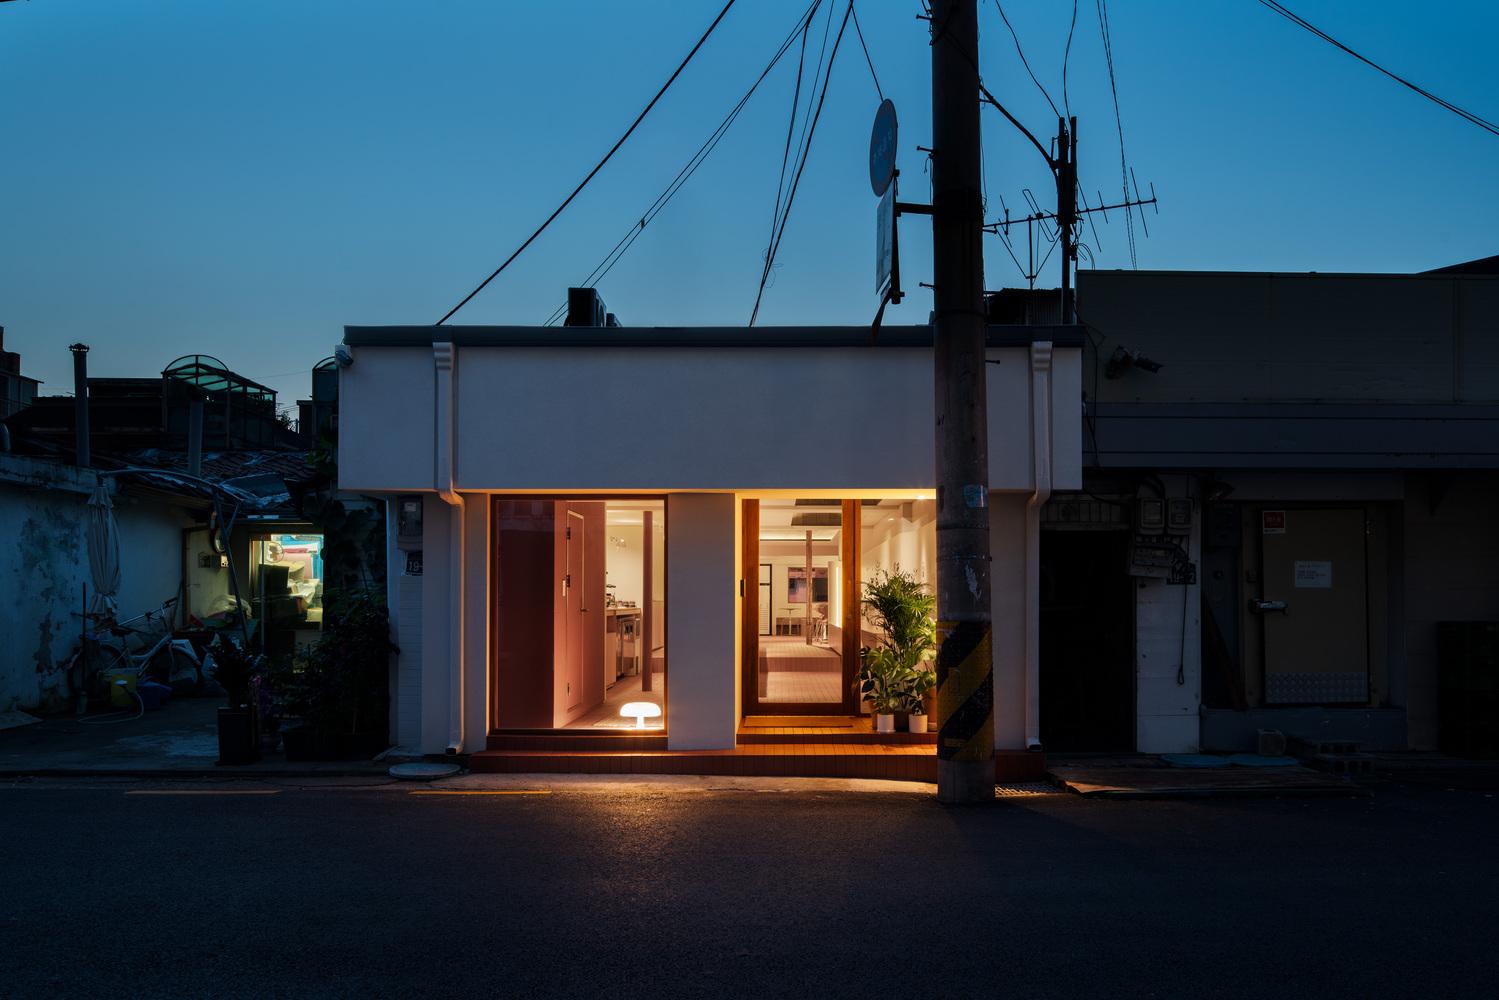 Seoul's PONT café is a railway office turned coffee shop